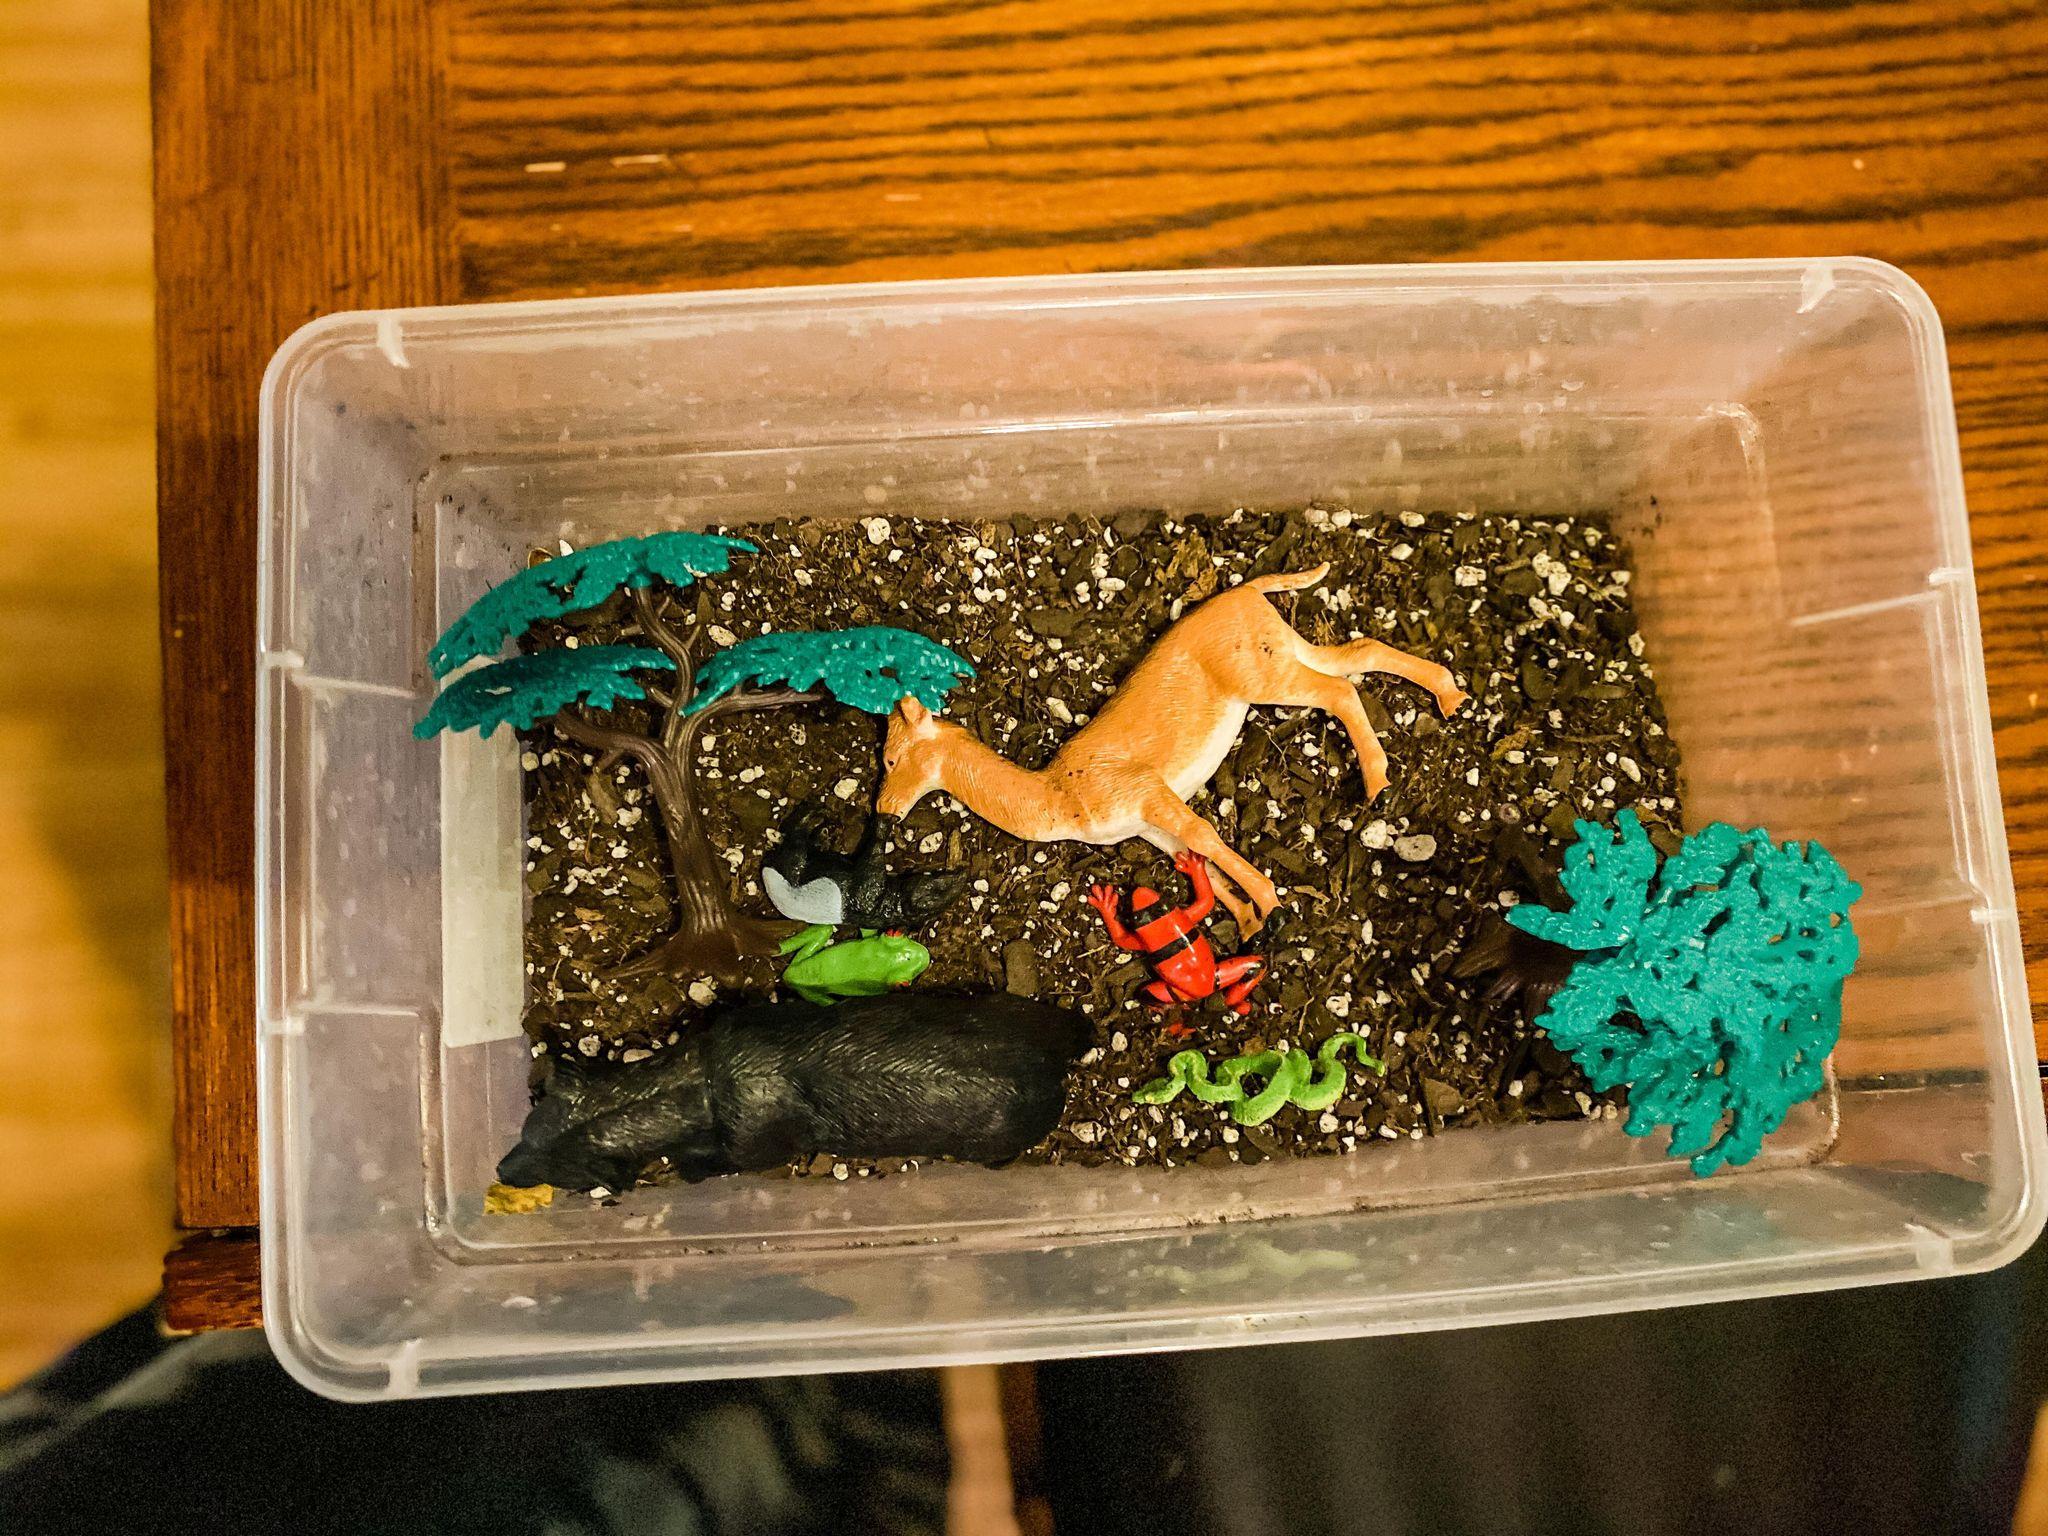 Forest Sensory Bin Activity for Preschoolers